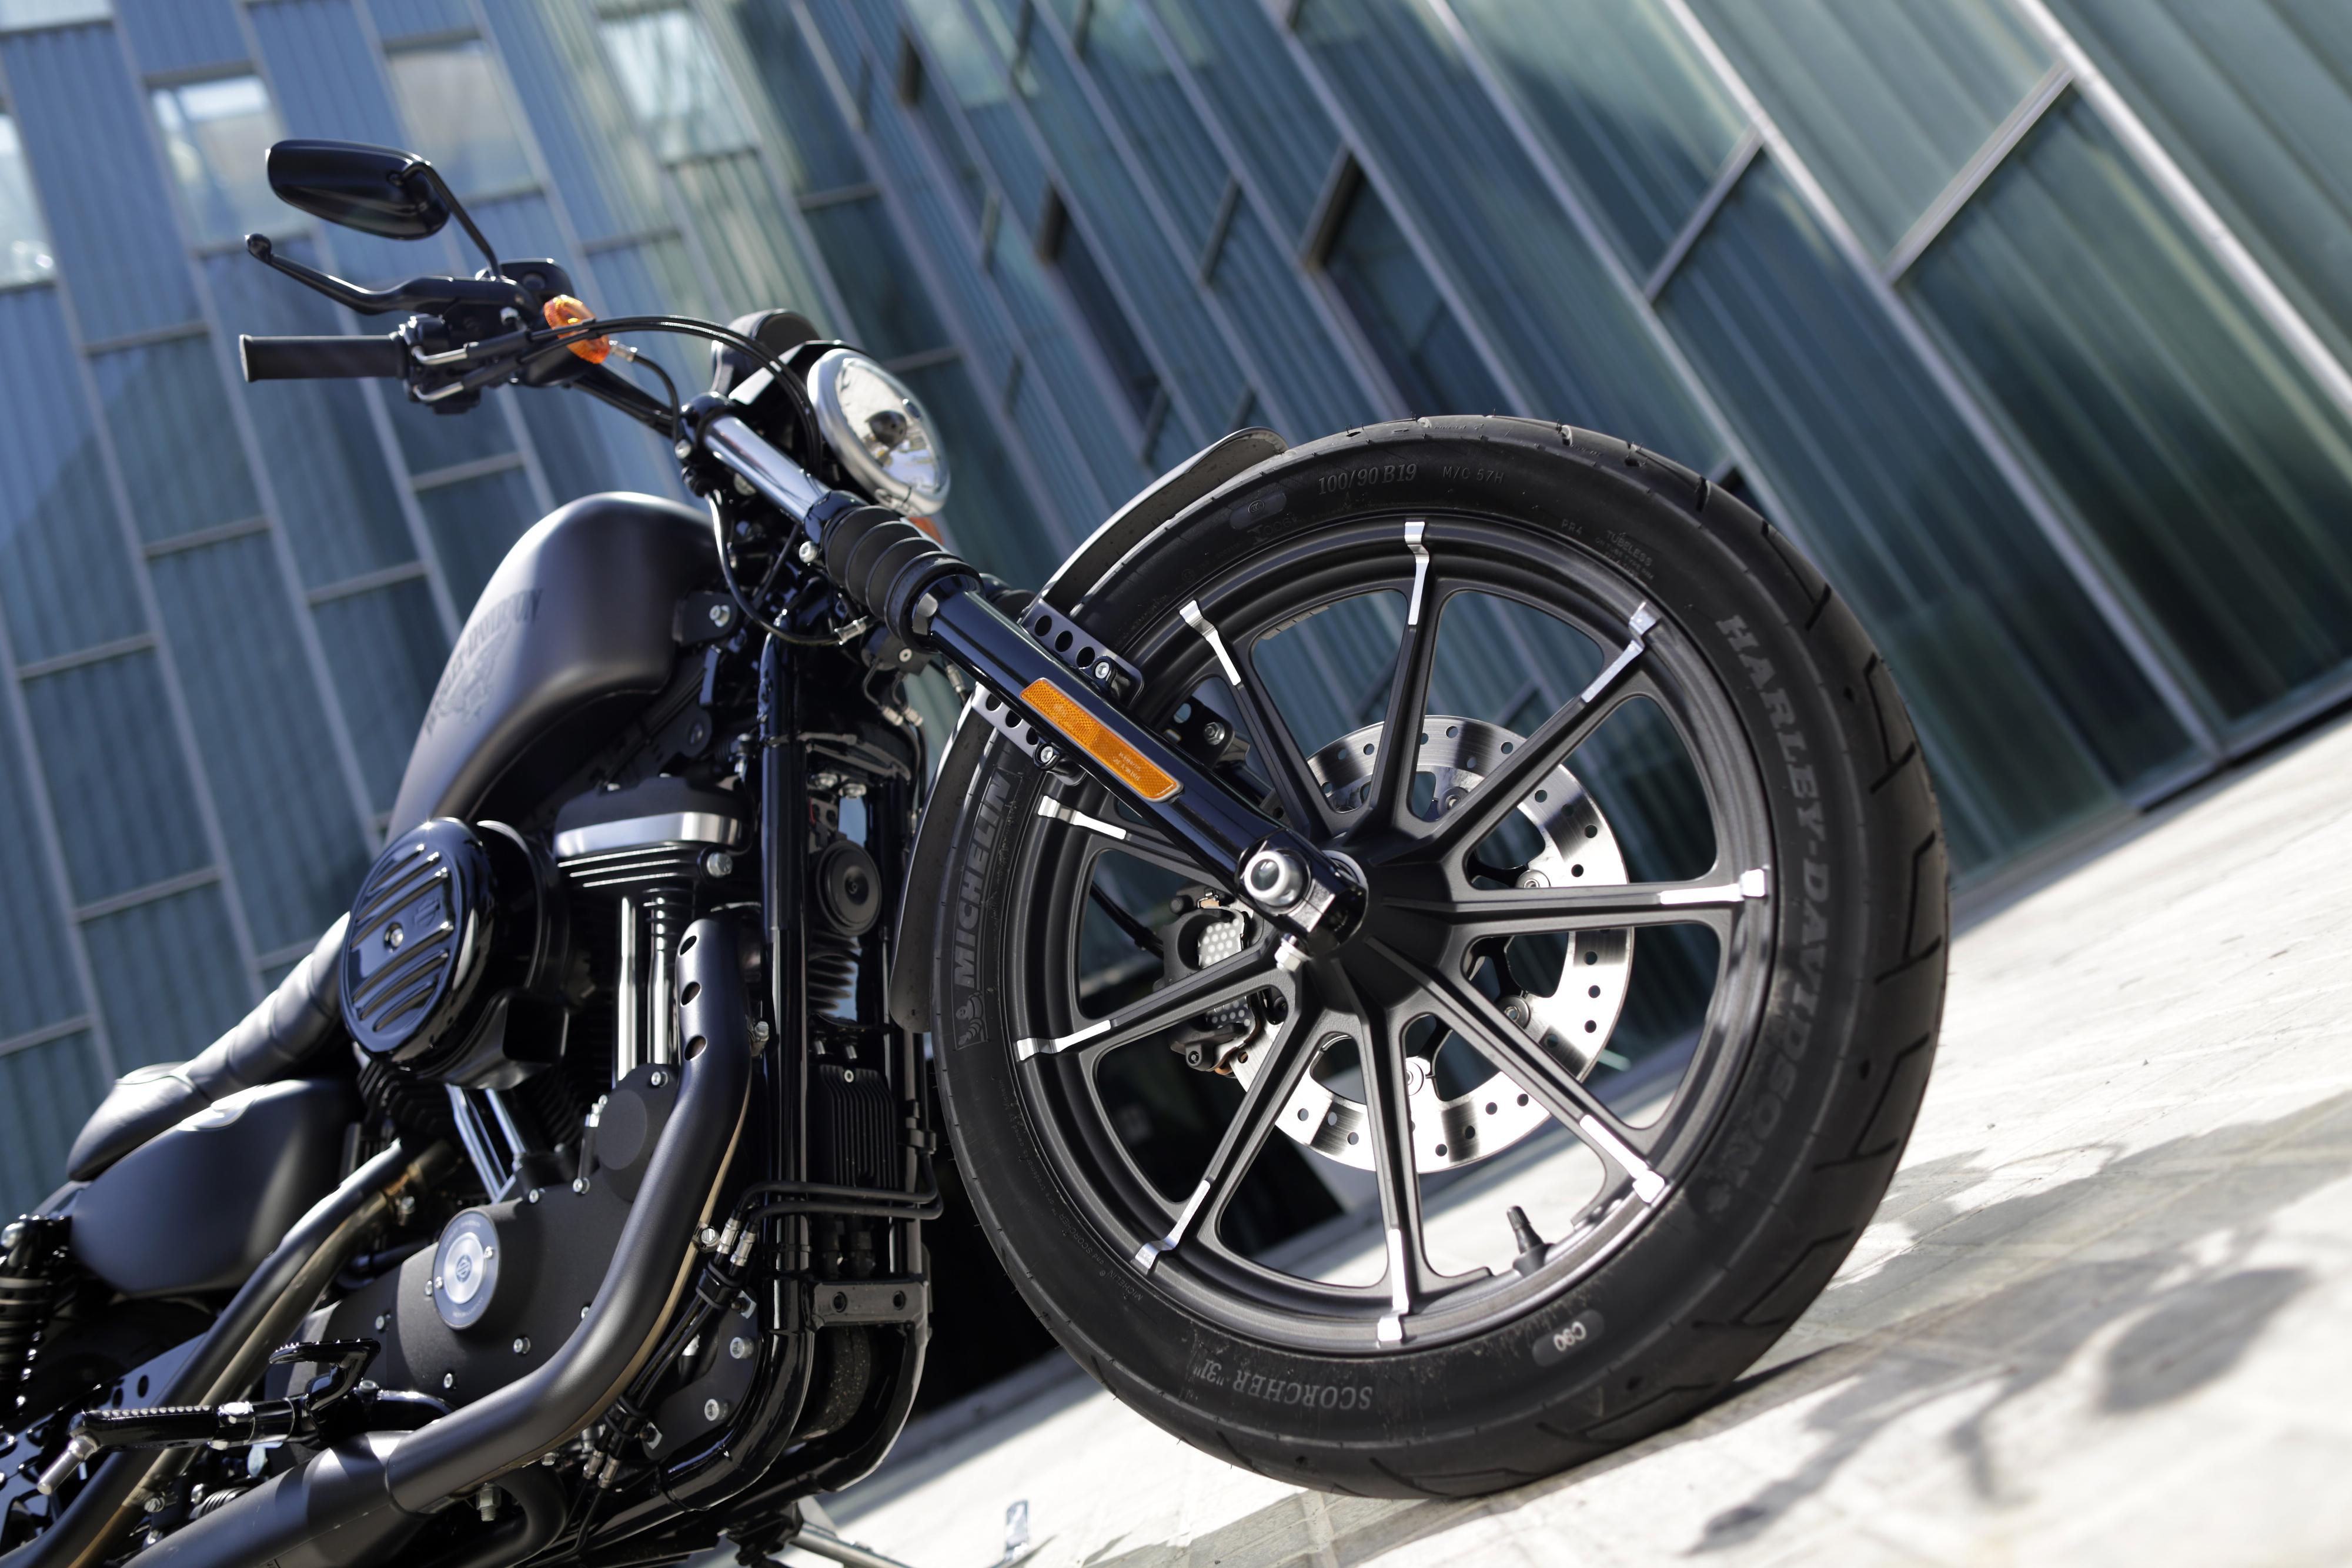 First Ride Harley Davidson Sportster Ir Visordown